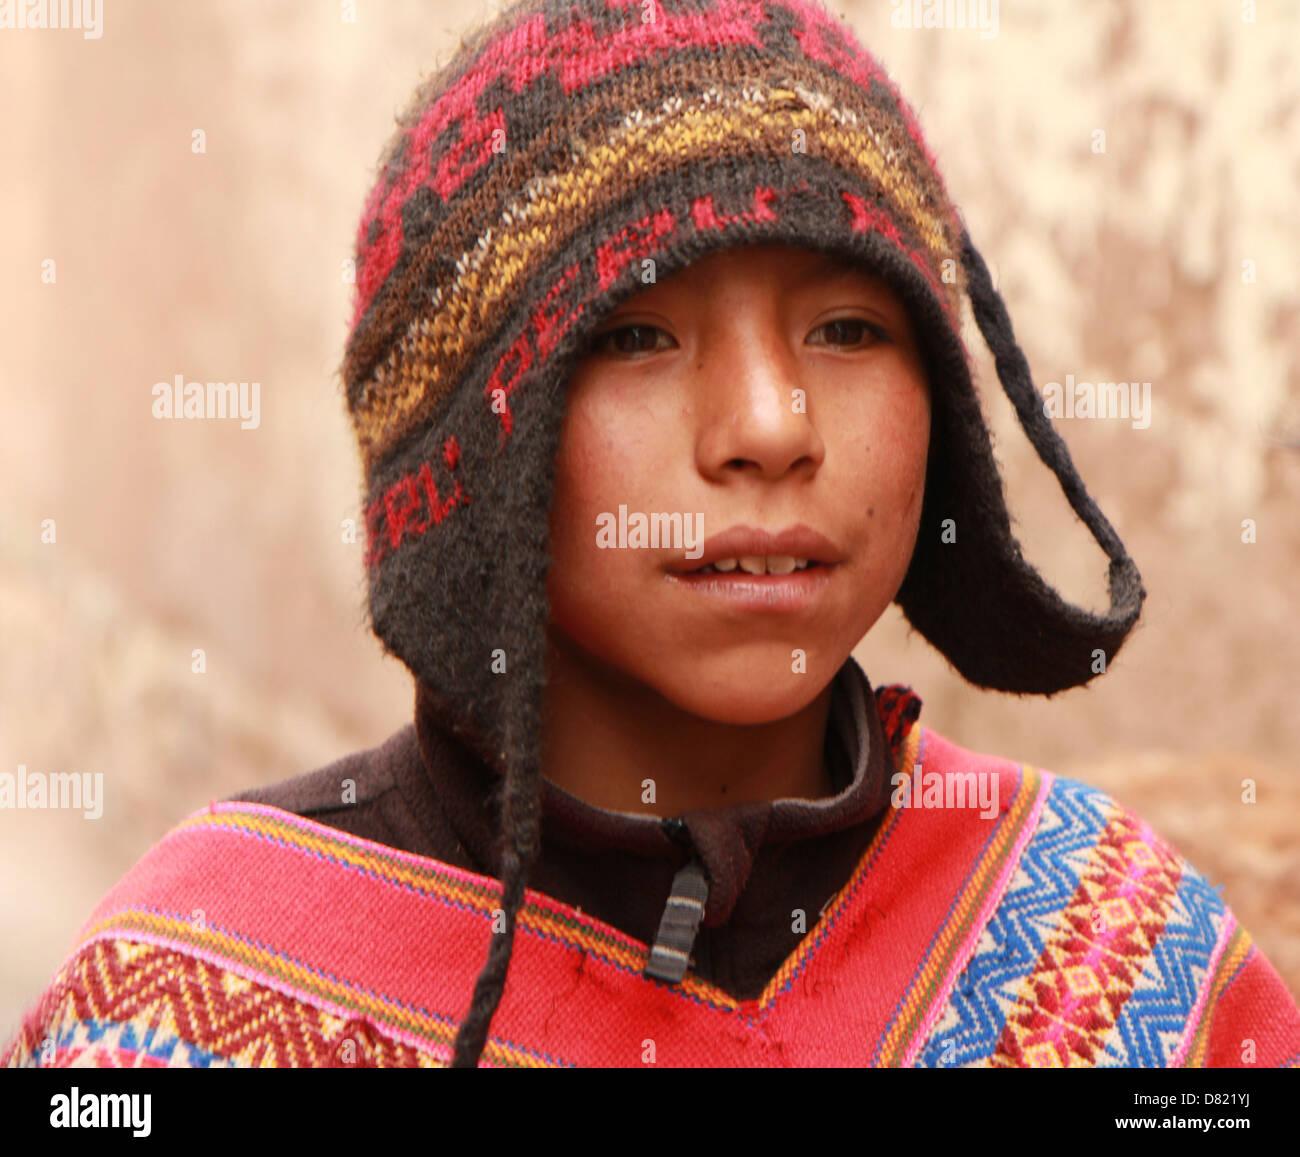 Un niño Quechua lleva un chulo tradicional sombrero y poncho en las calles  de Cusco 3b9e04e7d30